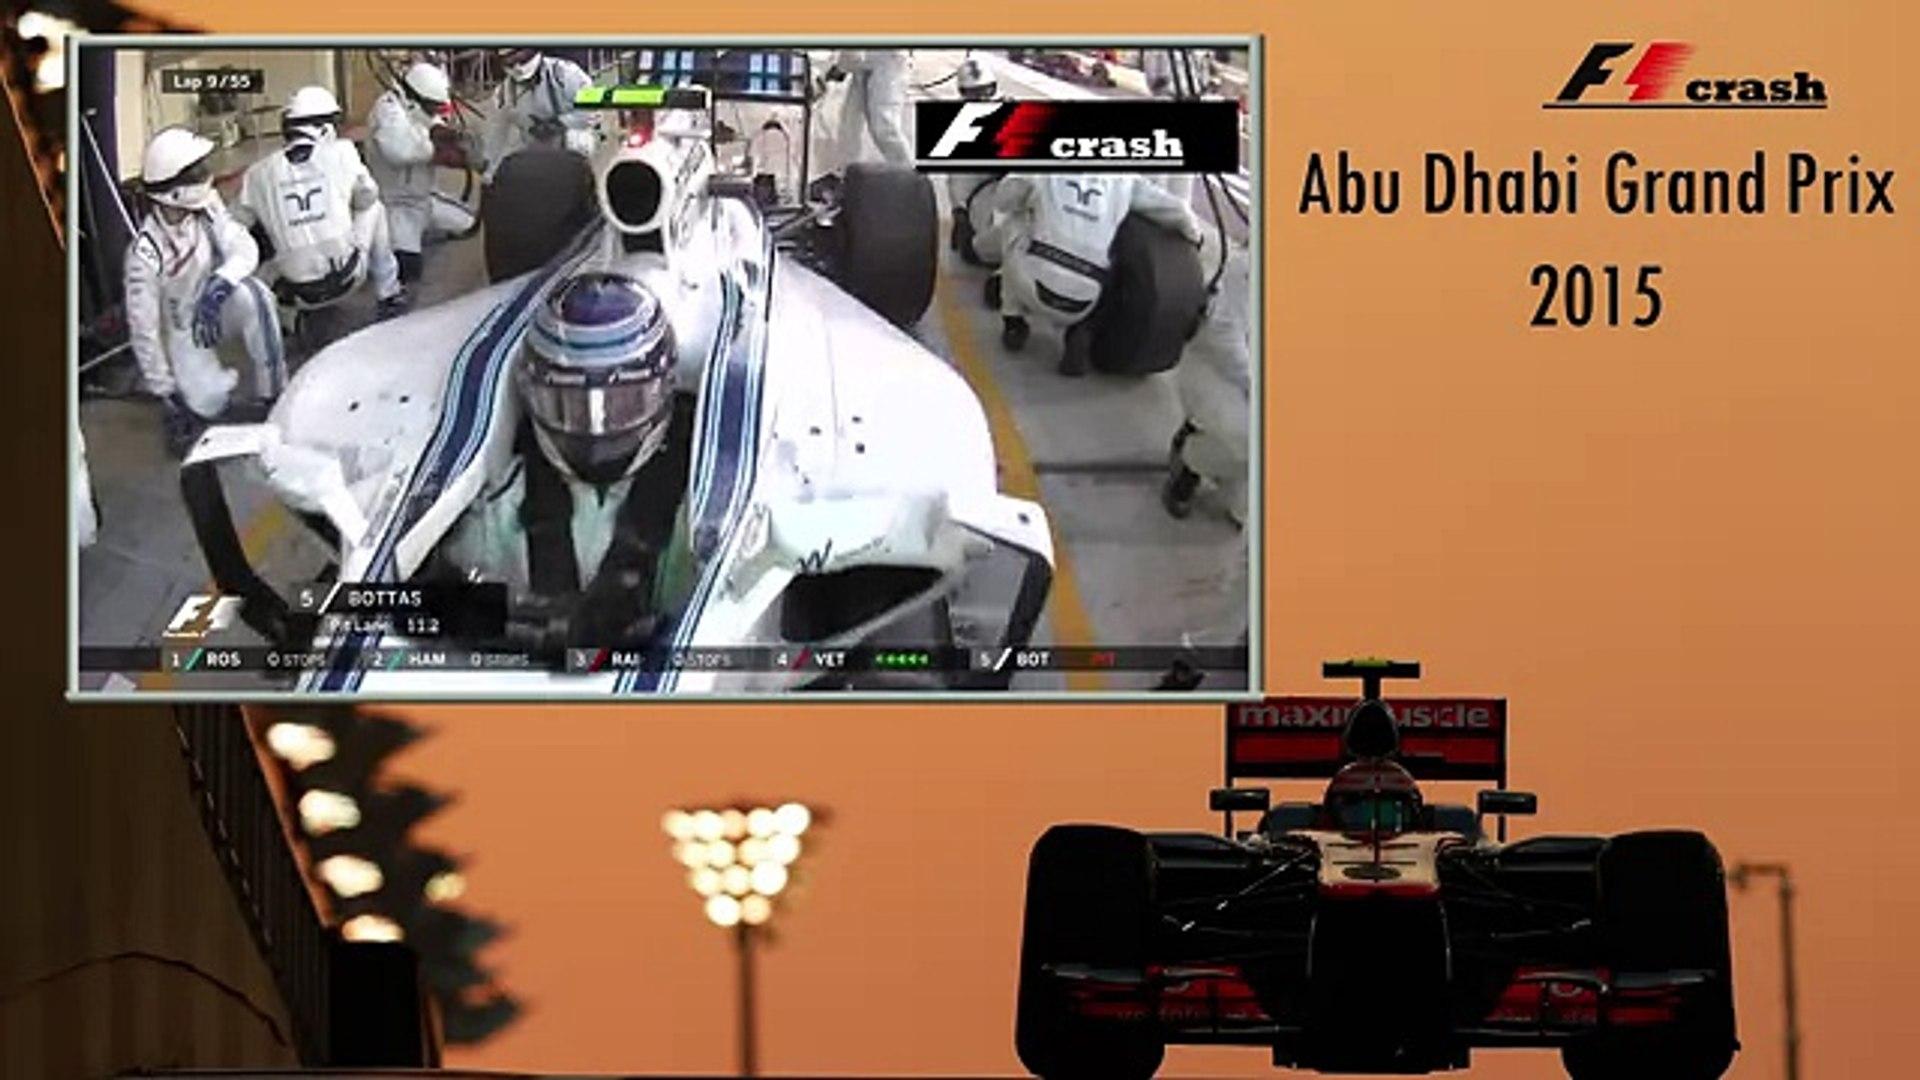 Формула 1 2015, Абу Даби, авария, Дженсон Баттон, Валттери Боттас